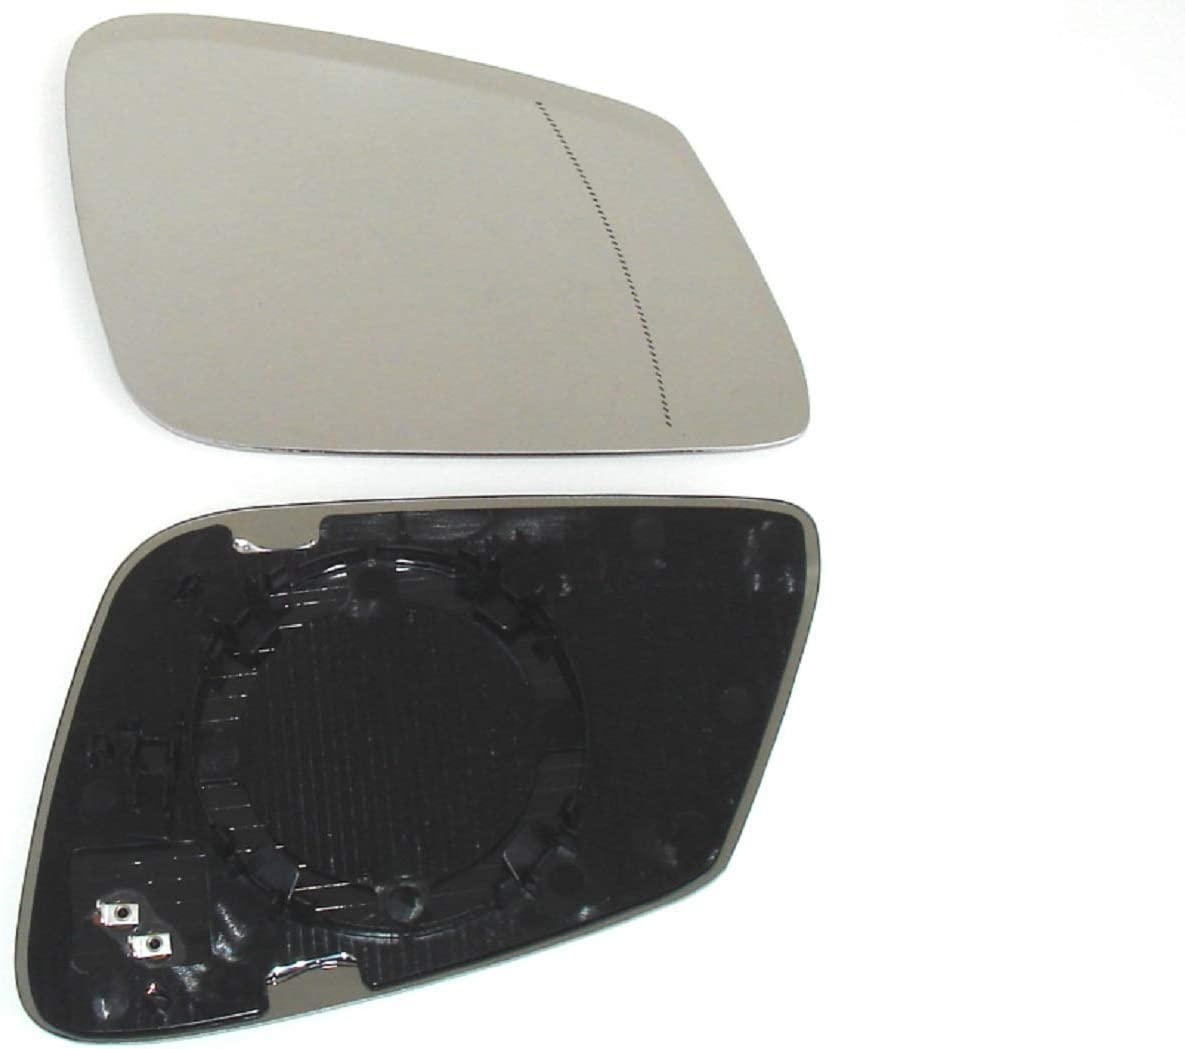 NICHT ABBLENDBAR Pro!Carpentis Spiegel Spiegelglas rechts kompatibel mit X1 E84 ab 07.2012 1er F20 F21 3er F30 F31 F35 F80 X1 erst ab Facelift 2012